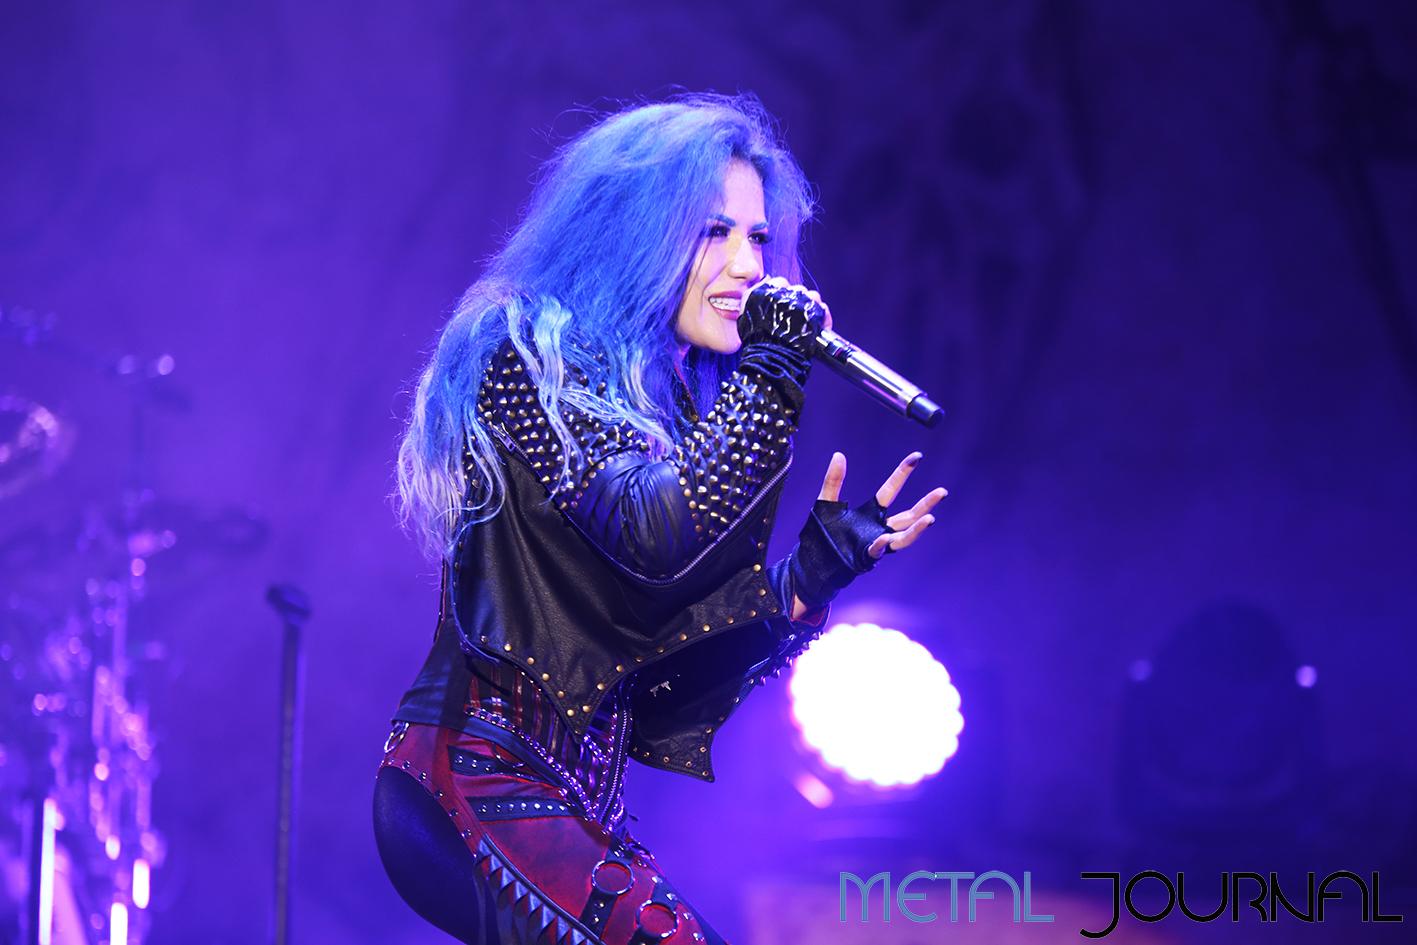 arch enemy - metal journal rock fest barcelona 2019 pic 9